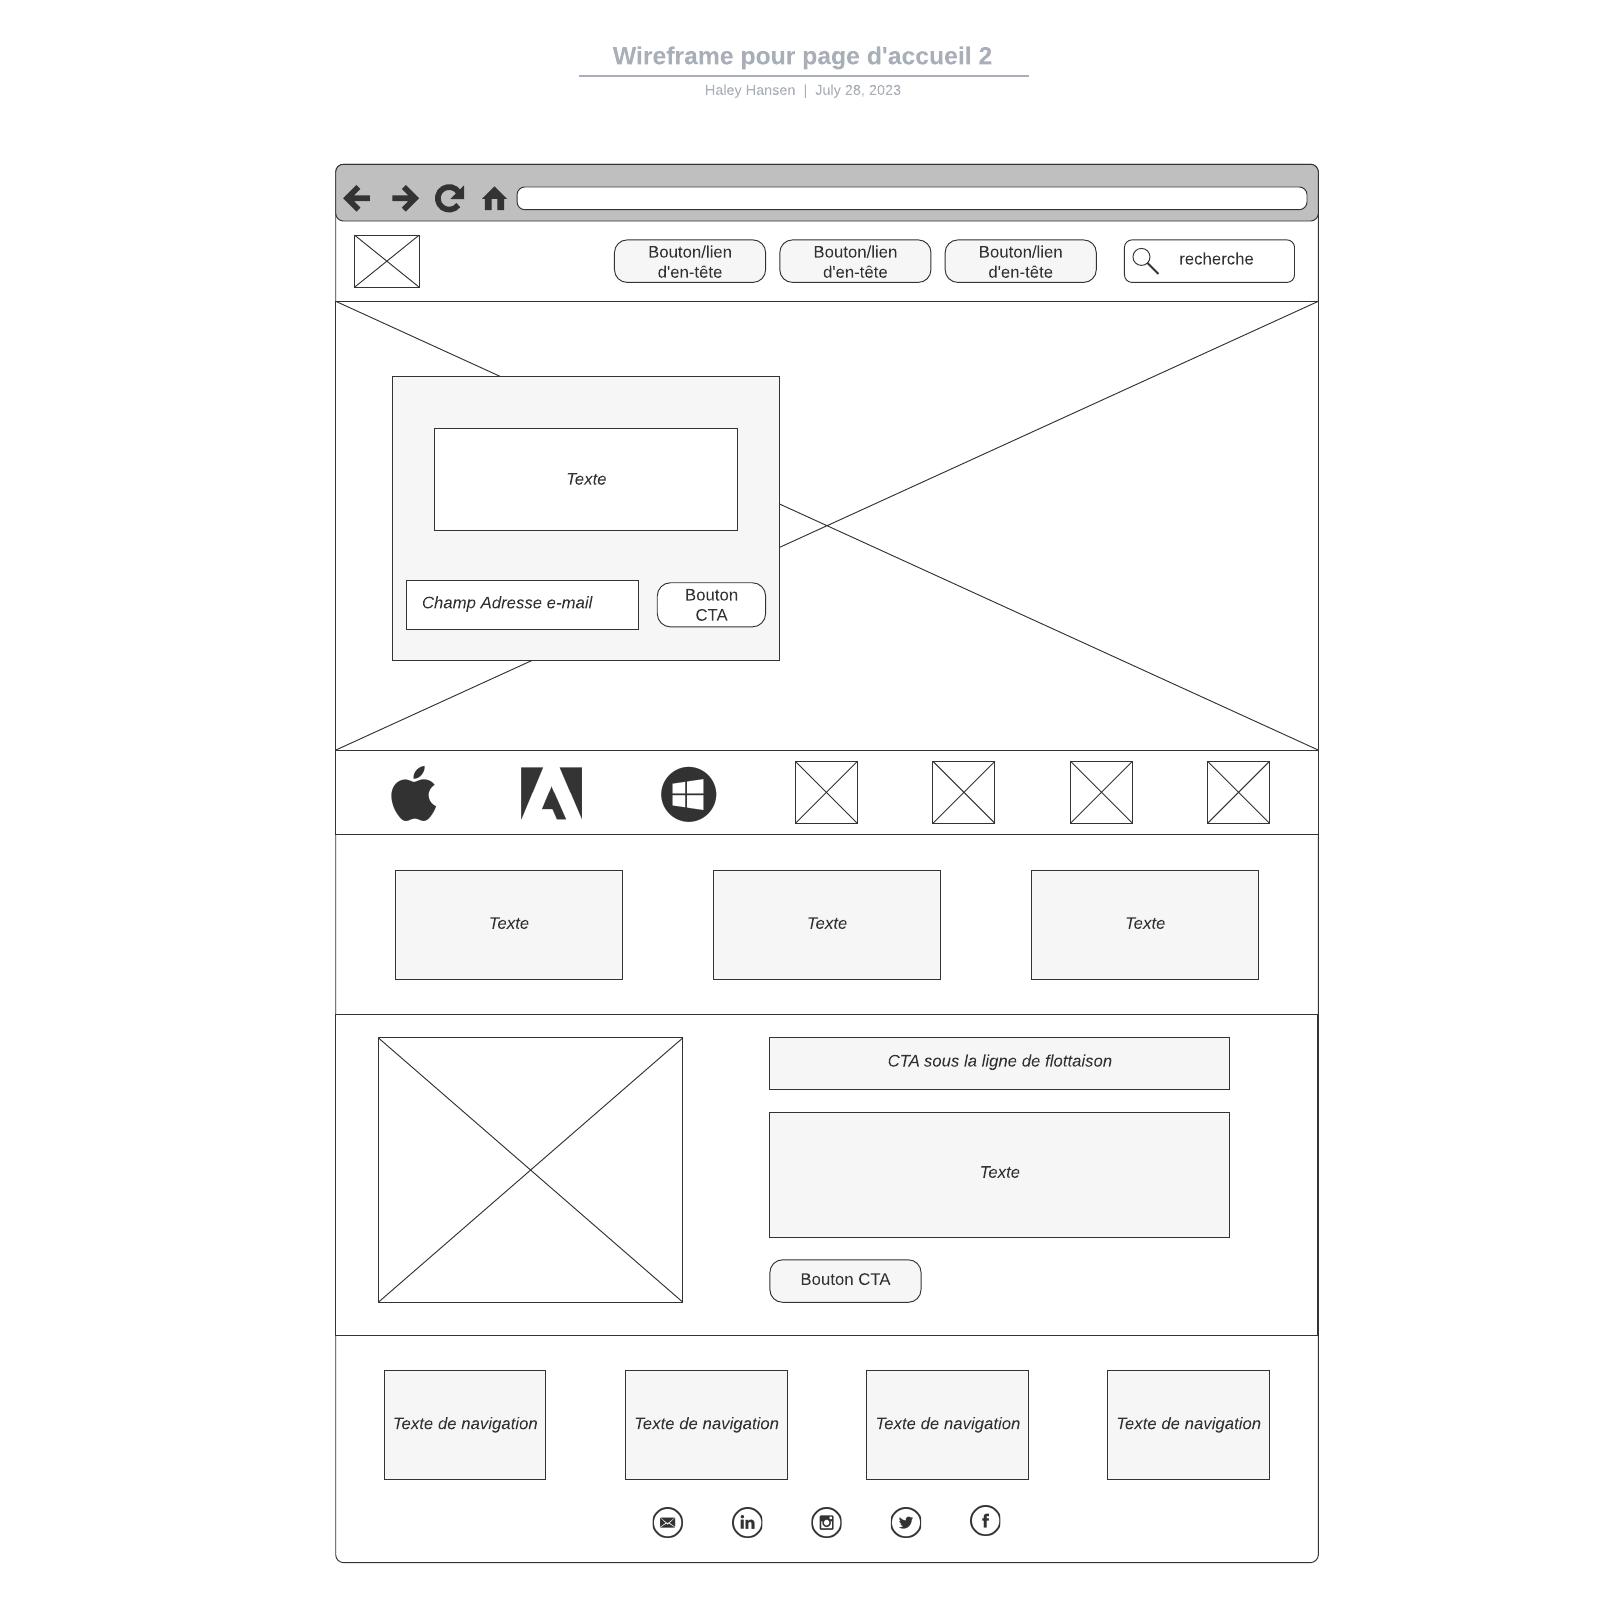 exemple de wireframe pour page d'accueil